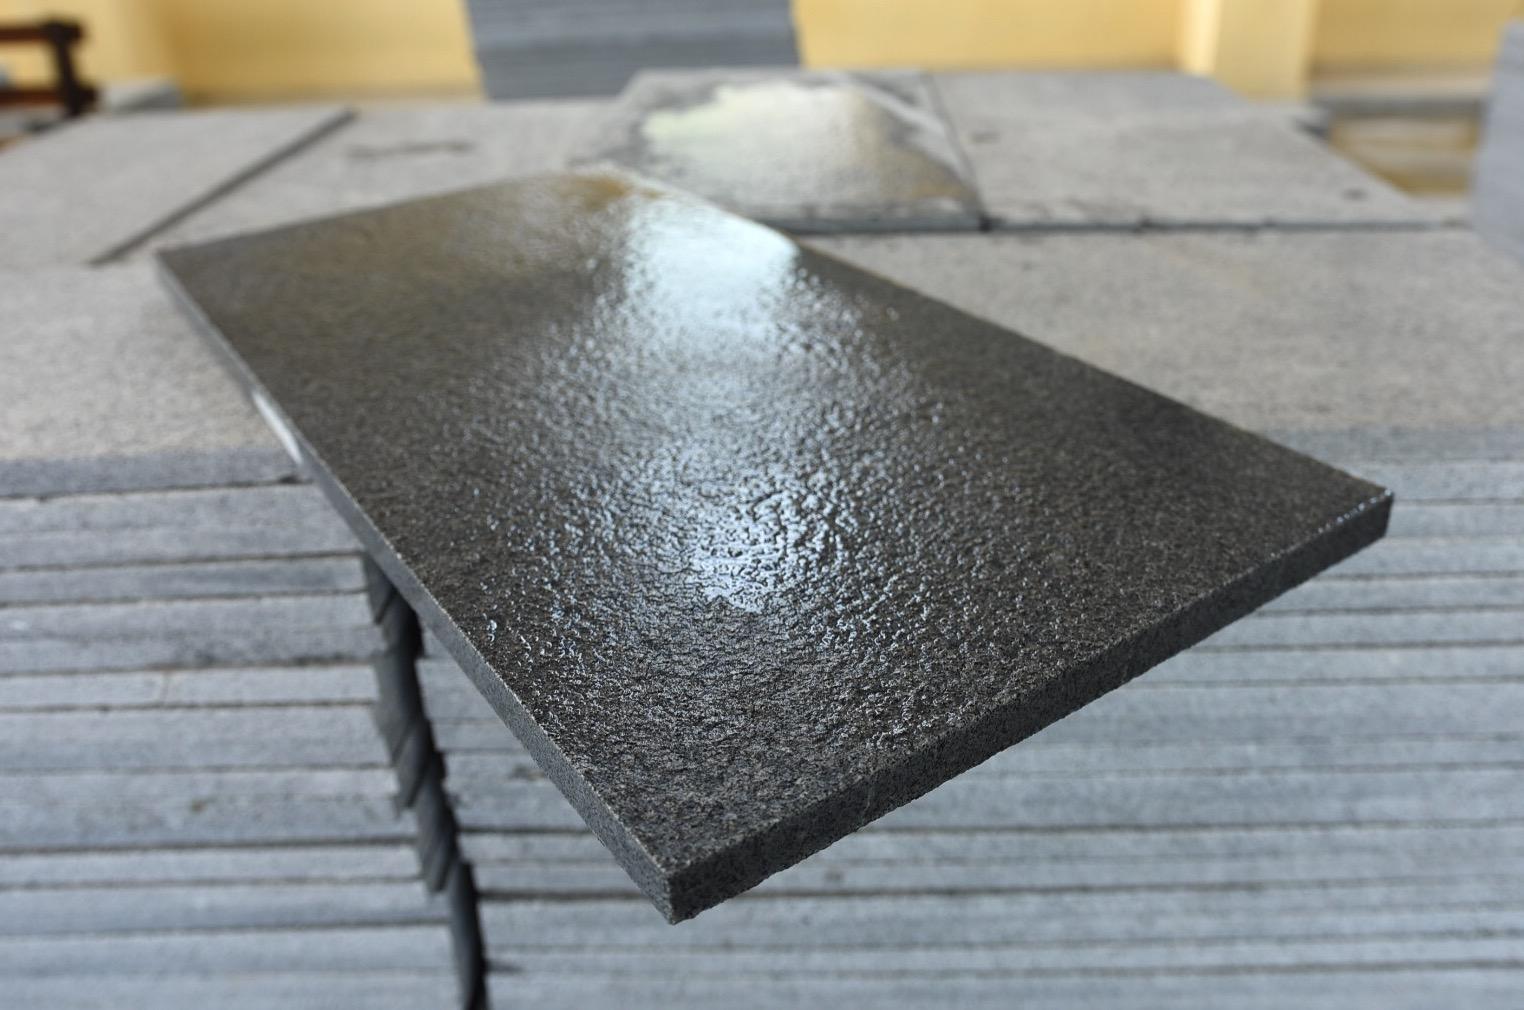 Вьетнамский темно-серый гранит G654(V) Паданг Дарк Экстра